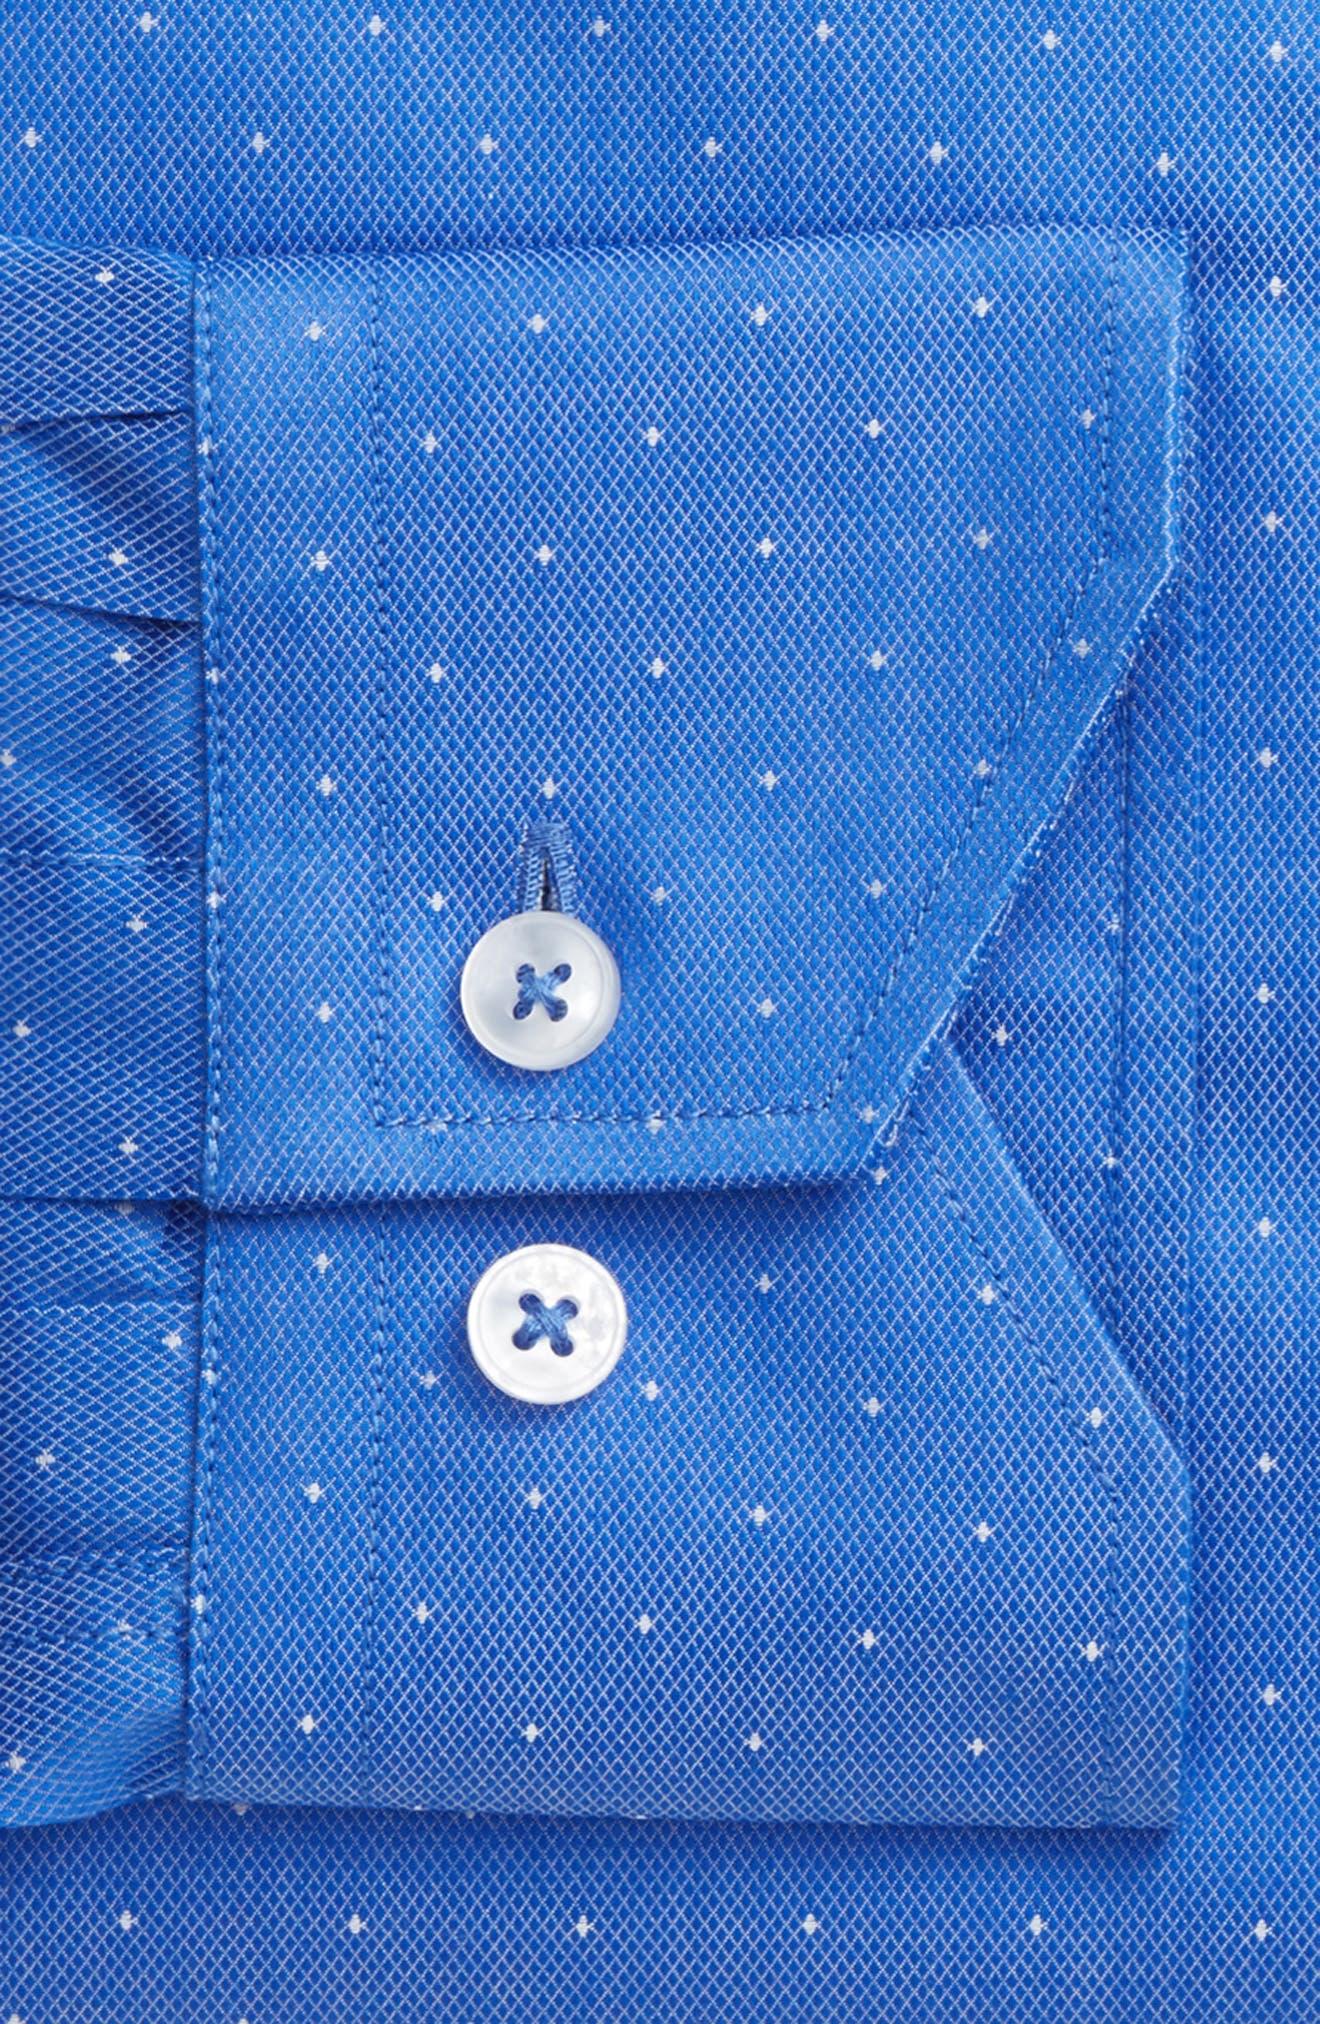 Trim Fit Dot Dress Shirt,                             Alternate thumbnail 4, color,                             ROYAL